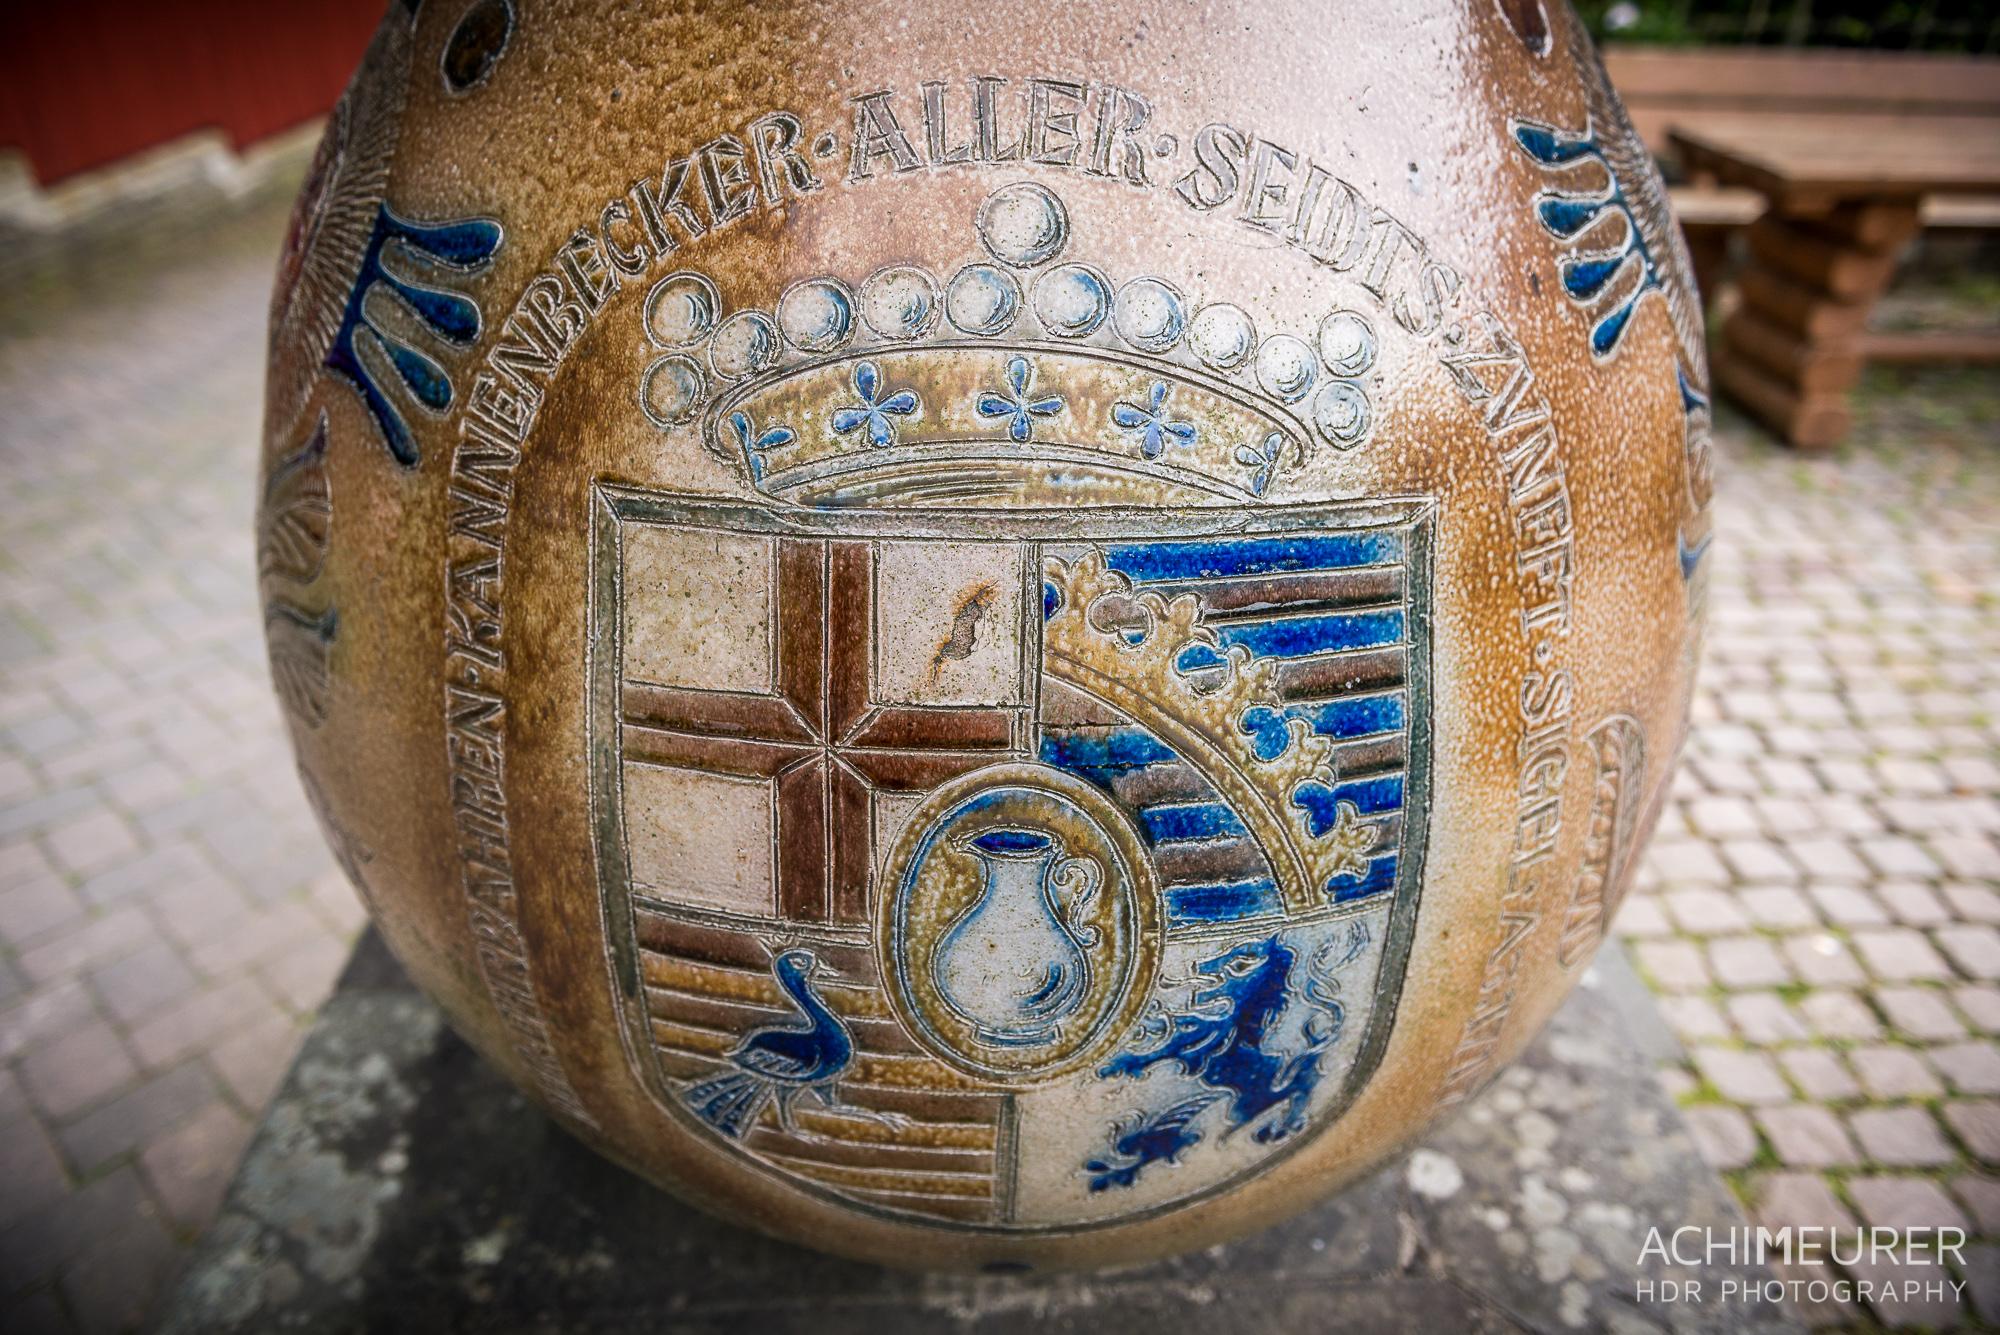 Kannenbaeckerland-keramik_4441